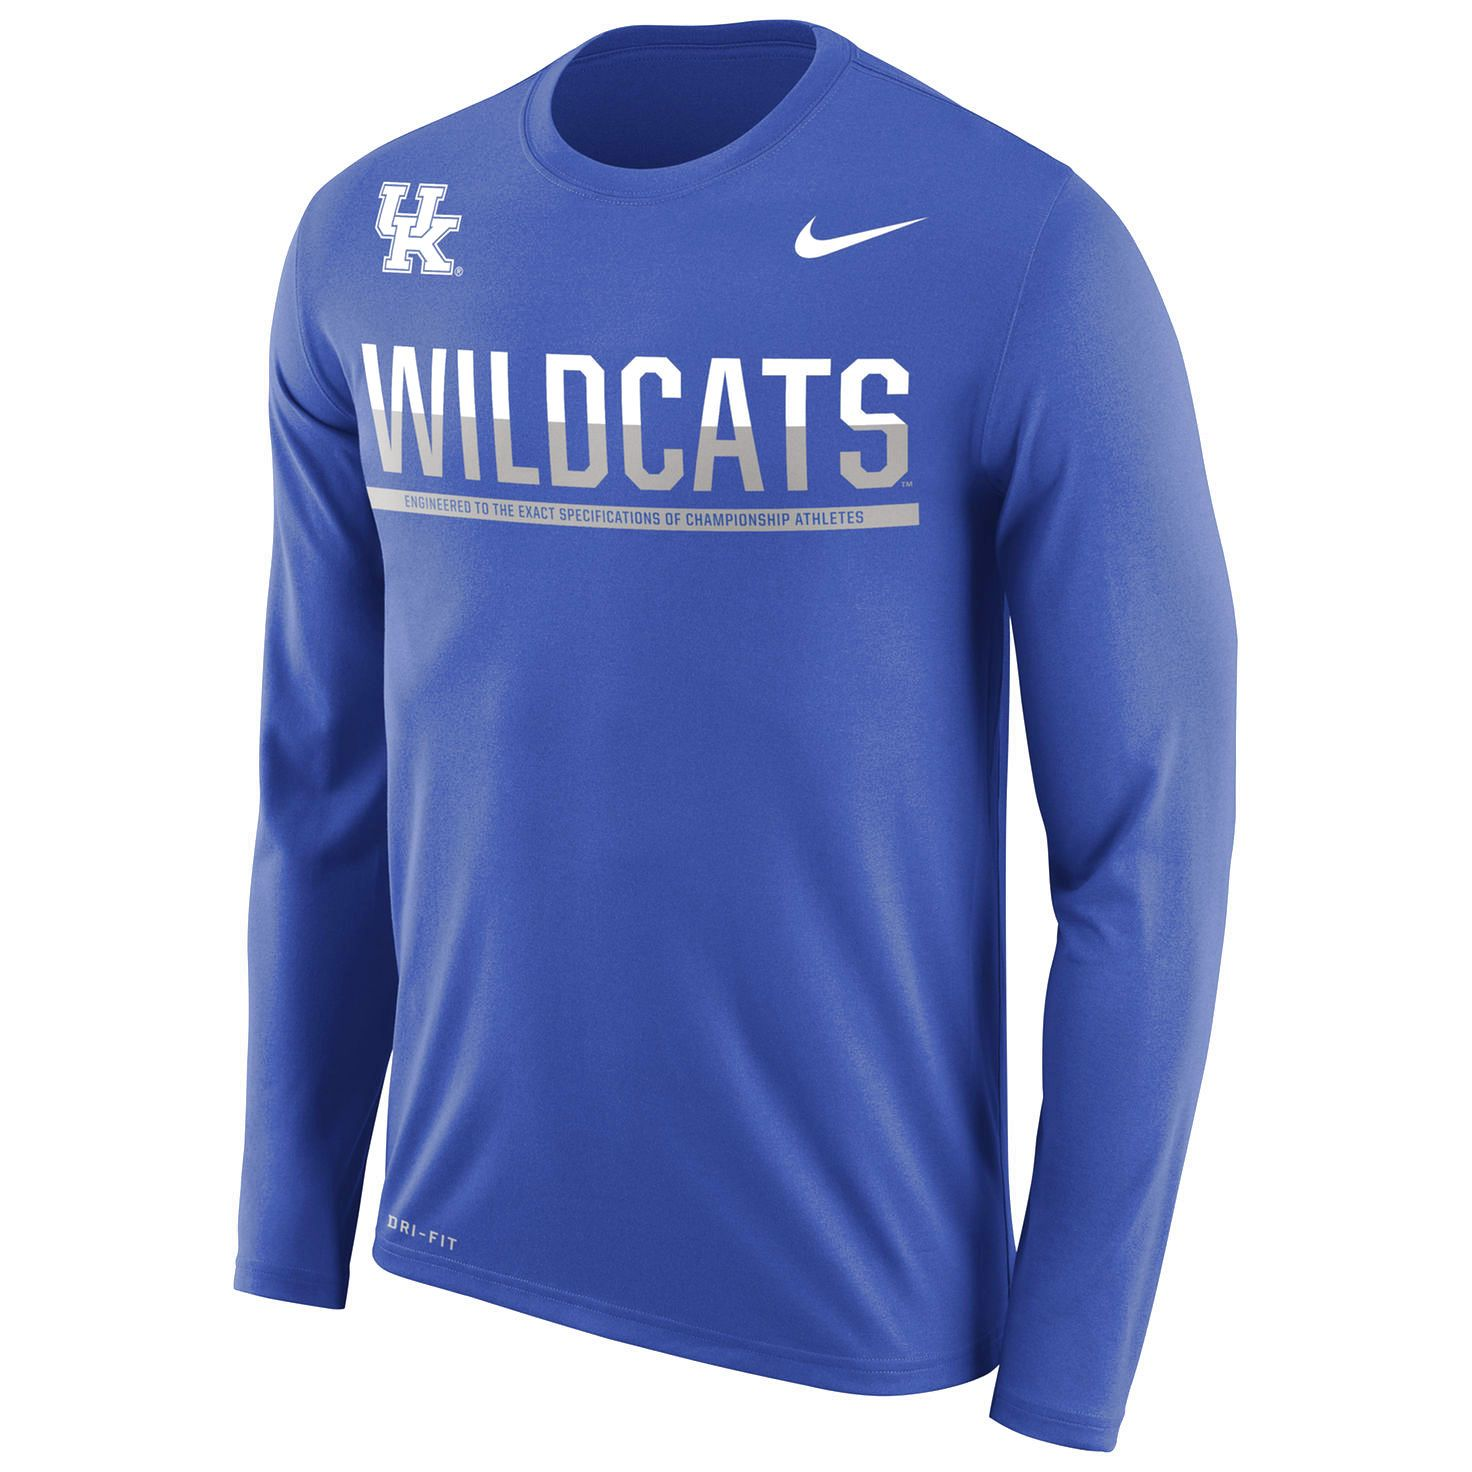 Kentucky Wildcats Nike 2016 Staff Sideline Legend Dri Fit Long Sleeve T Shirt Royal 35 99 Lsu Football Shirt Nike Men Long Sleeve Tshirt Men